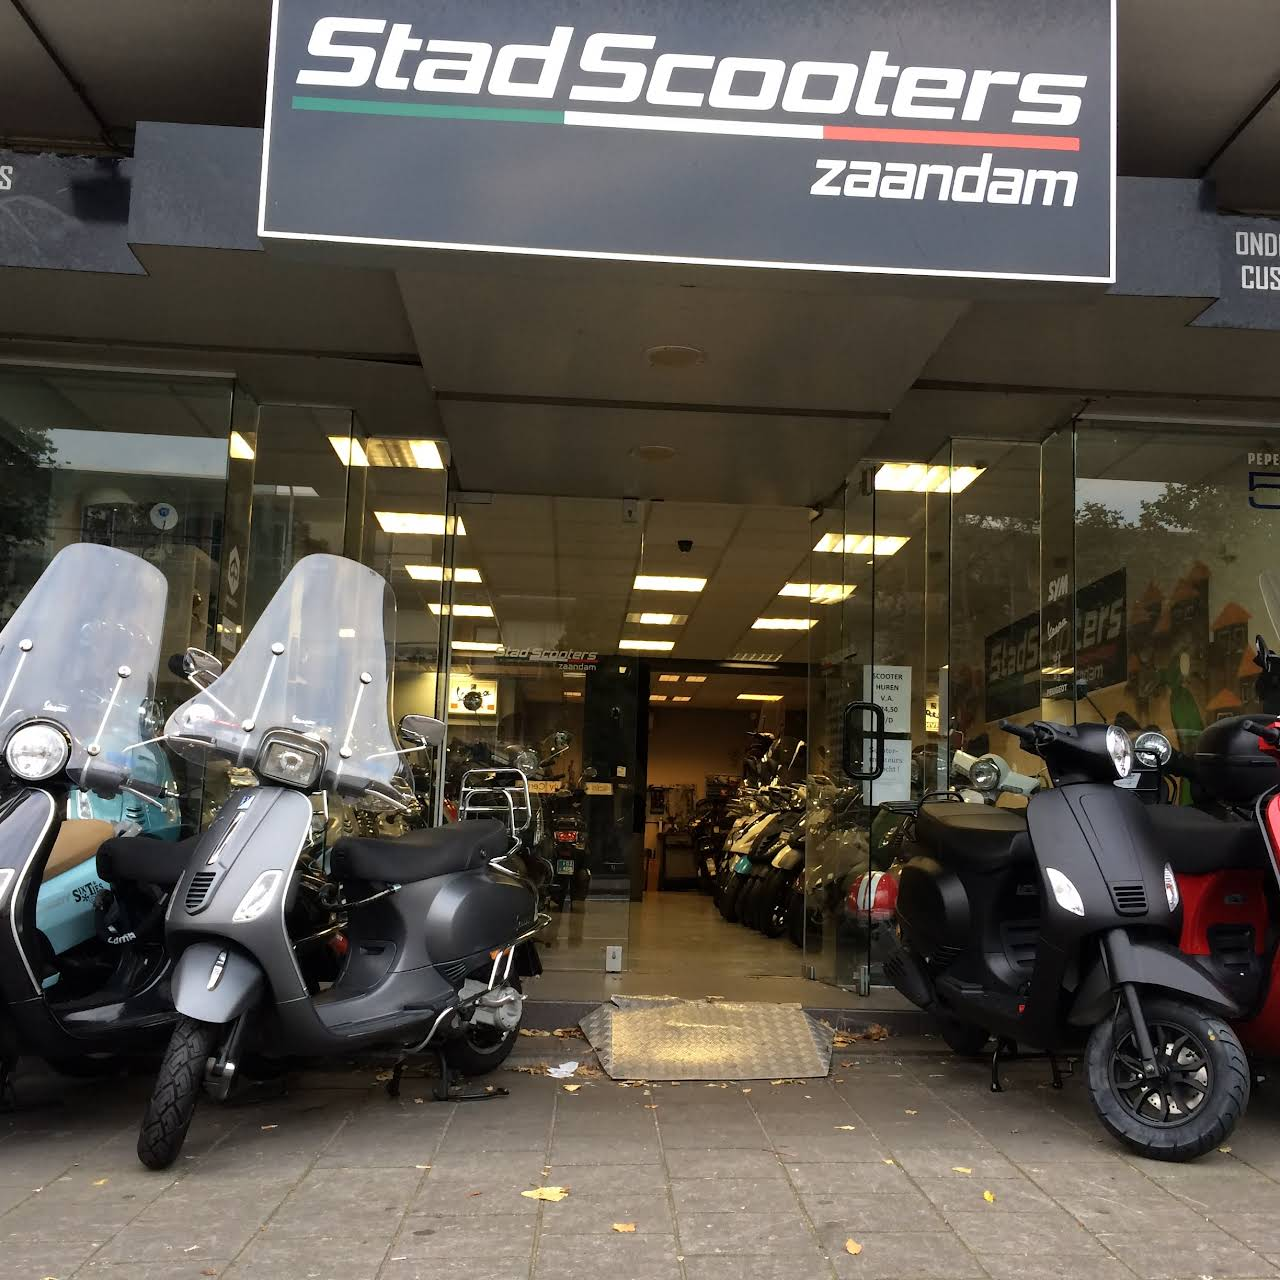 Nieuw Stadscooters Zaandam - Scooterwinkel in Zaandam IL-85